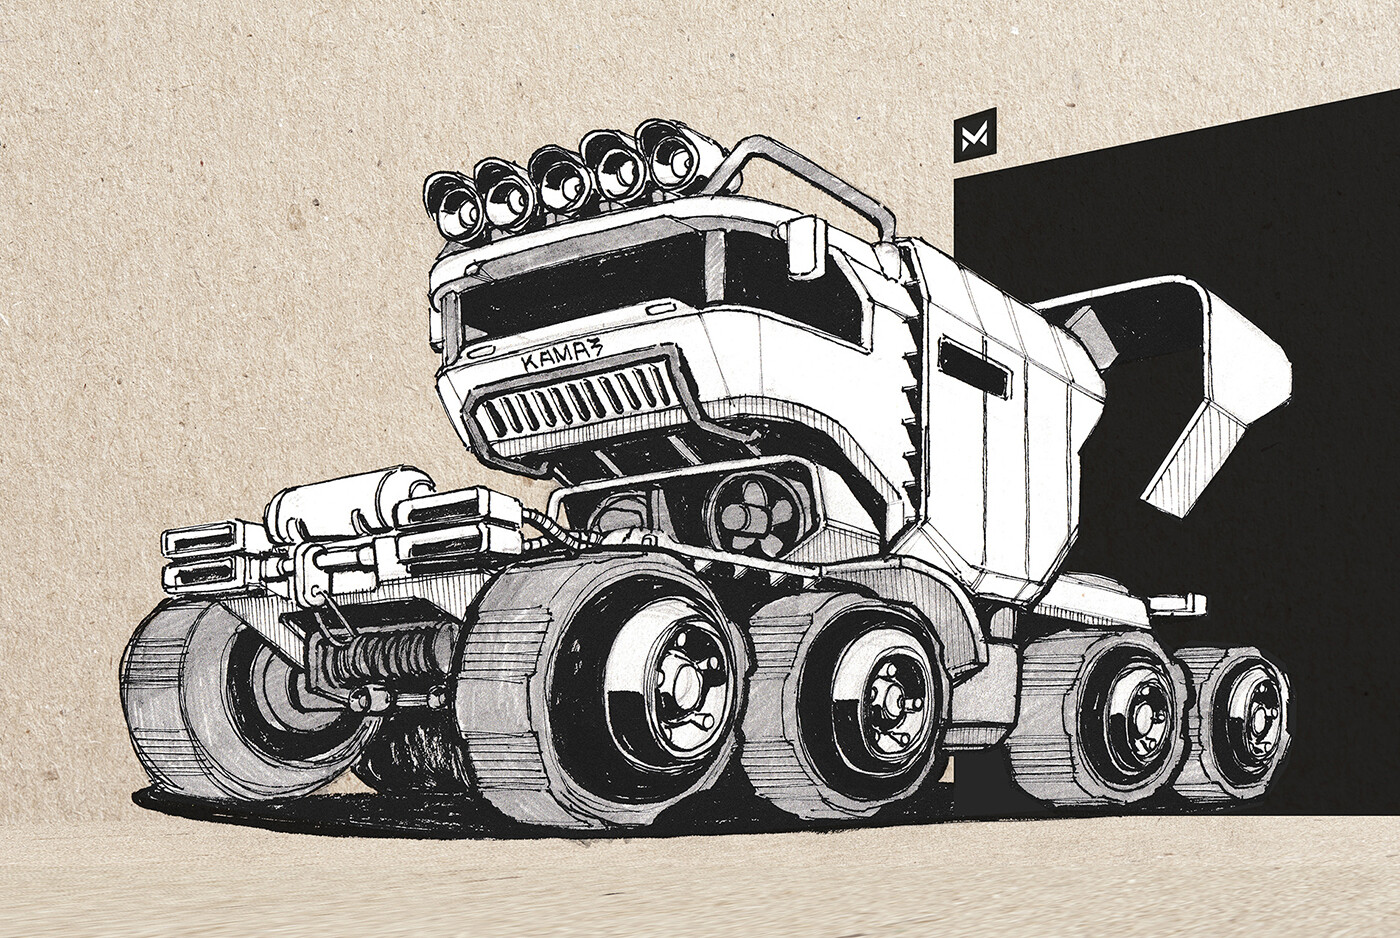 KAMAZ offroad truck concept